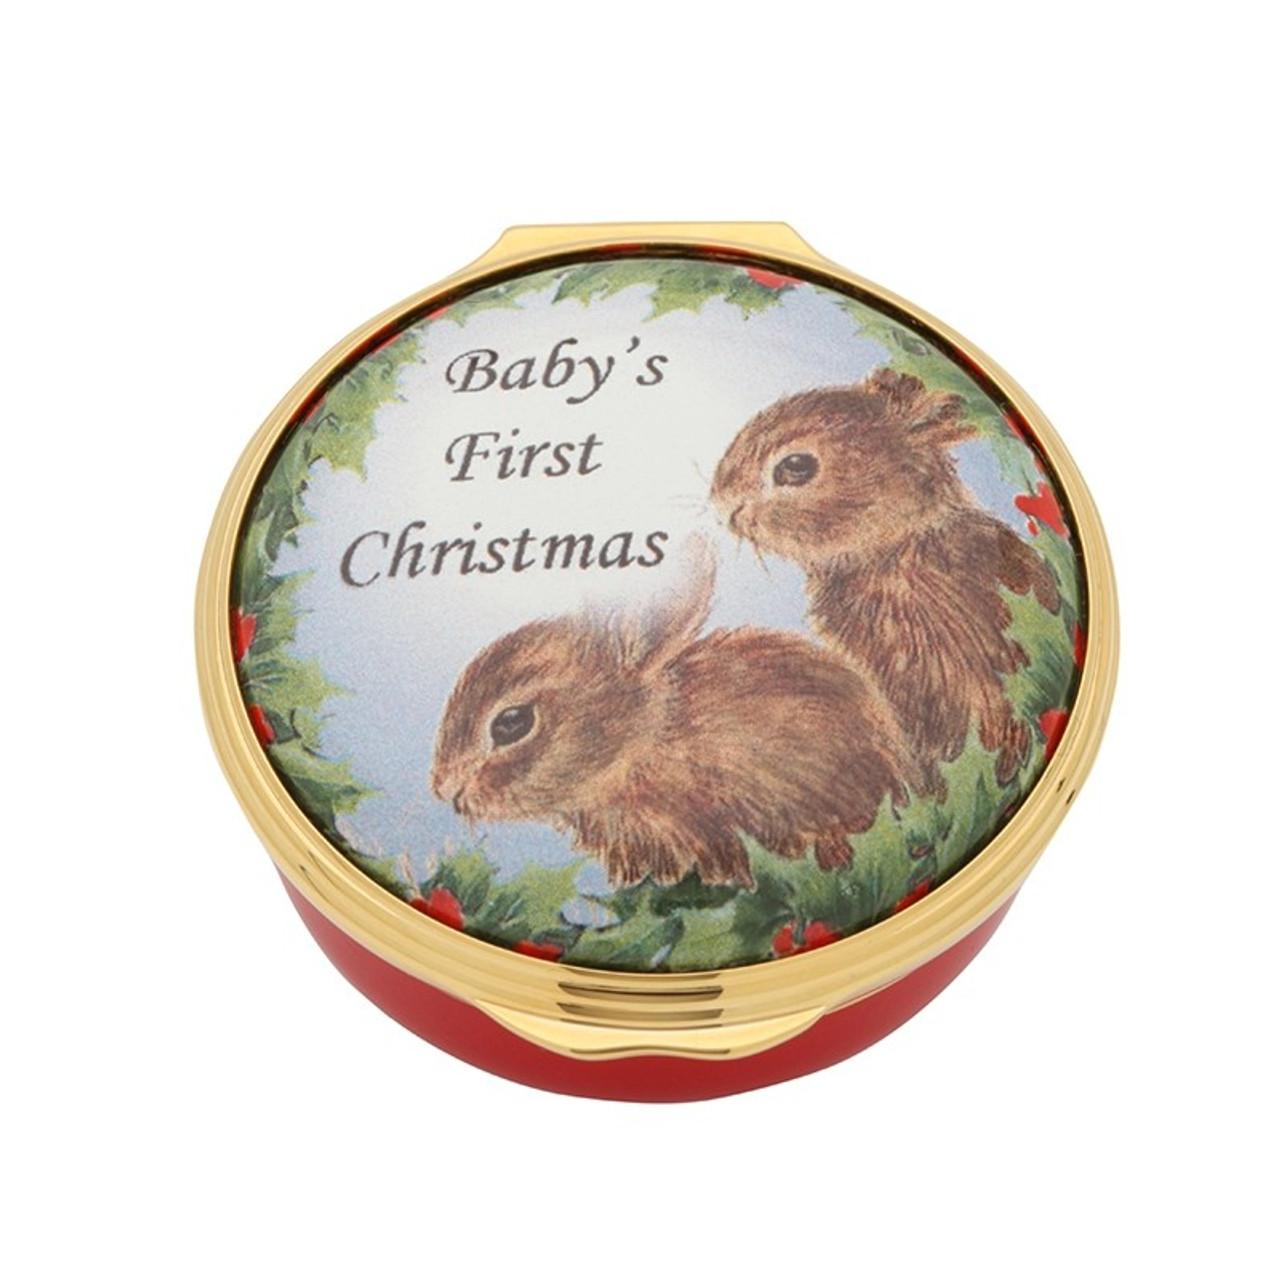 Halcyon Days Baby's First Christmas Enamel Box ENBFC0601G